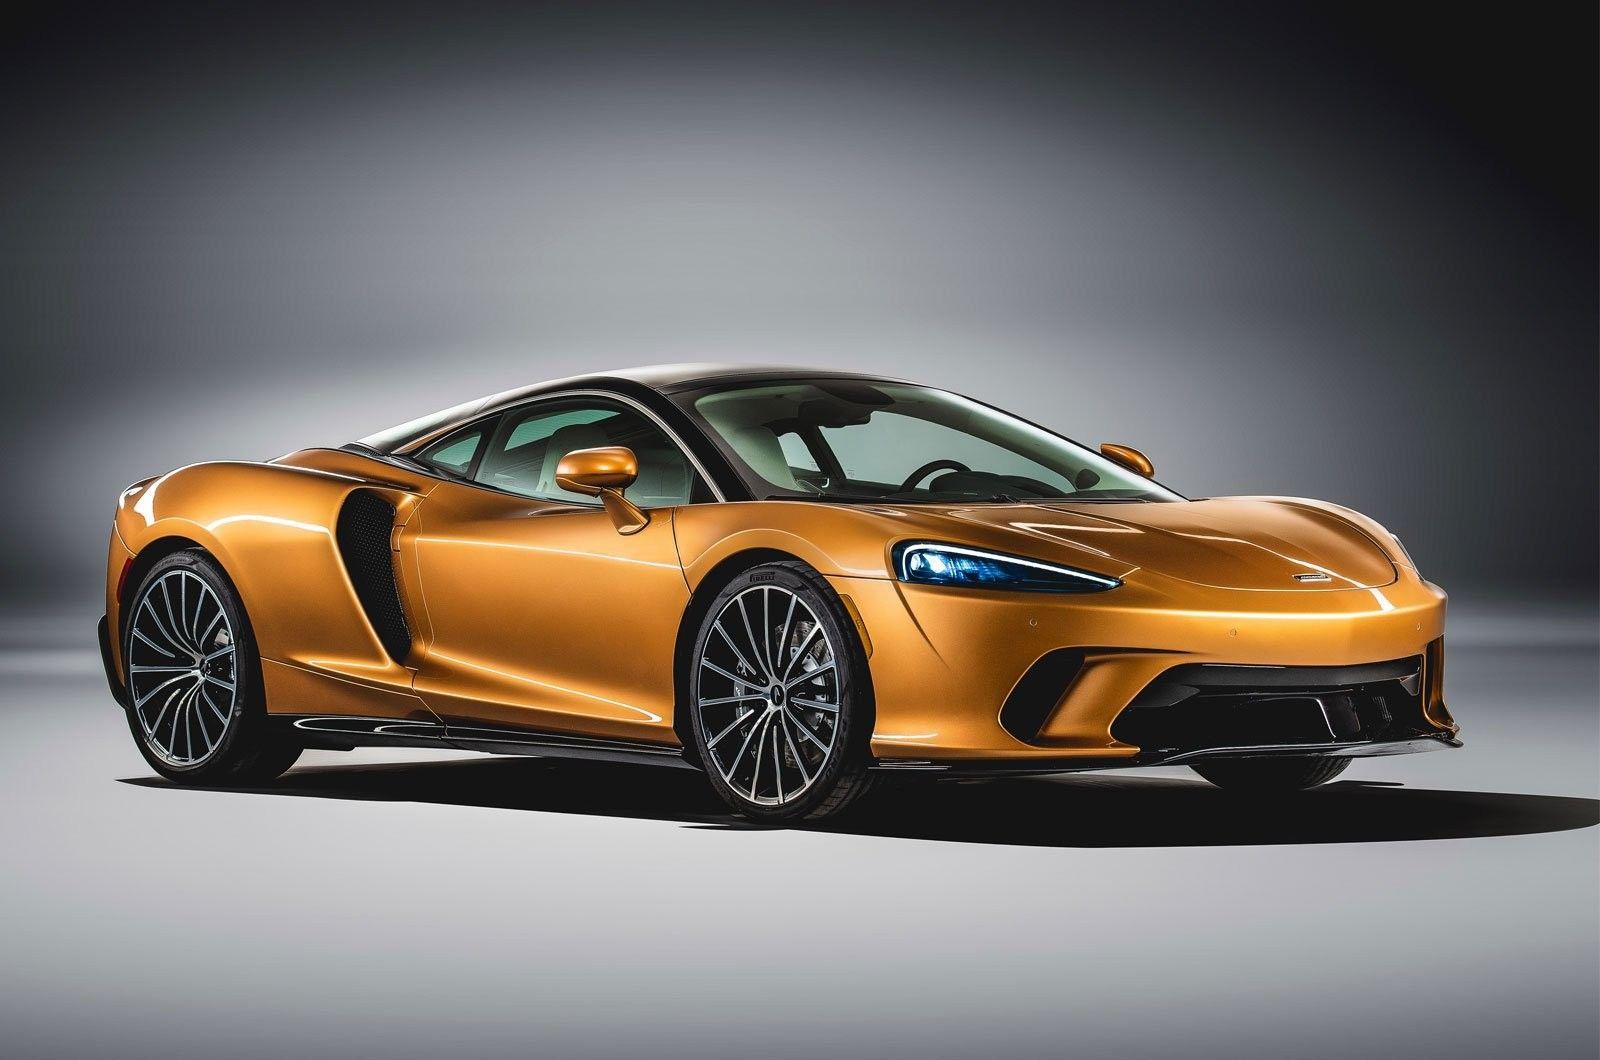 Mclaren Gt Sports Cars Luxury Mclaren Most Popular Cars